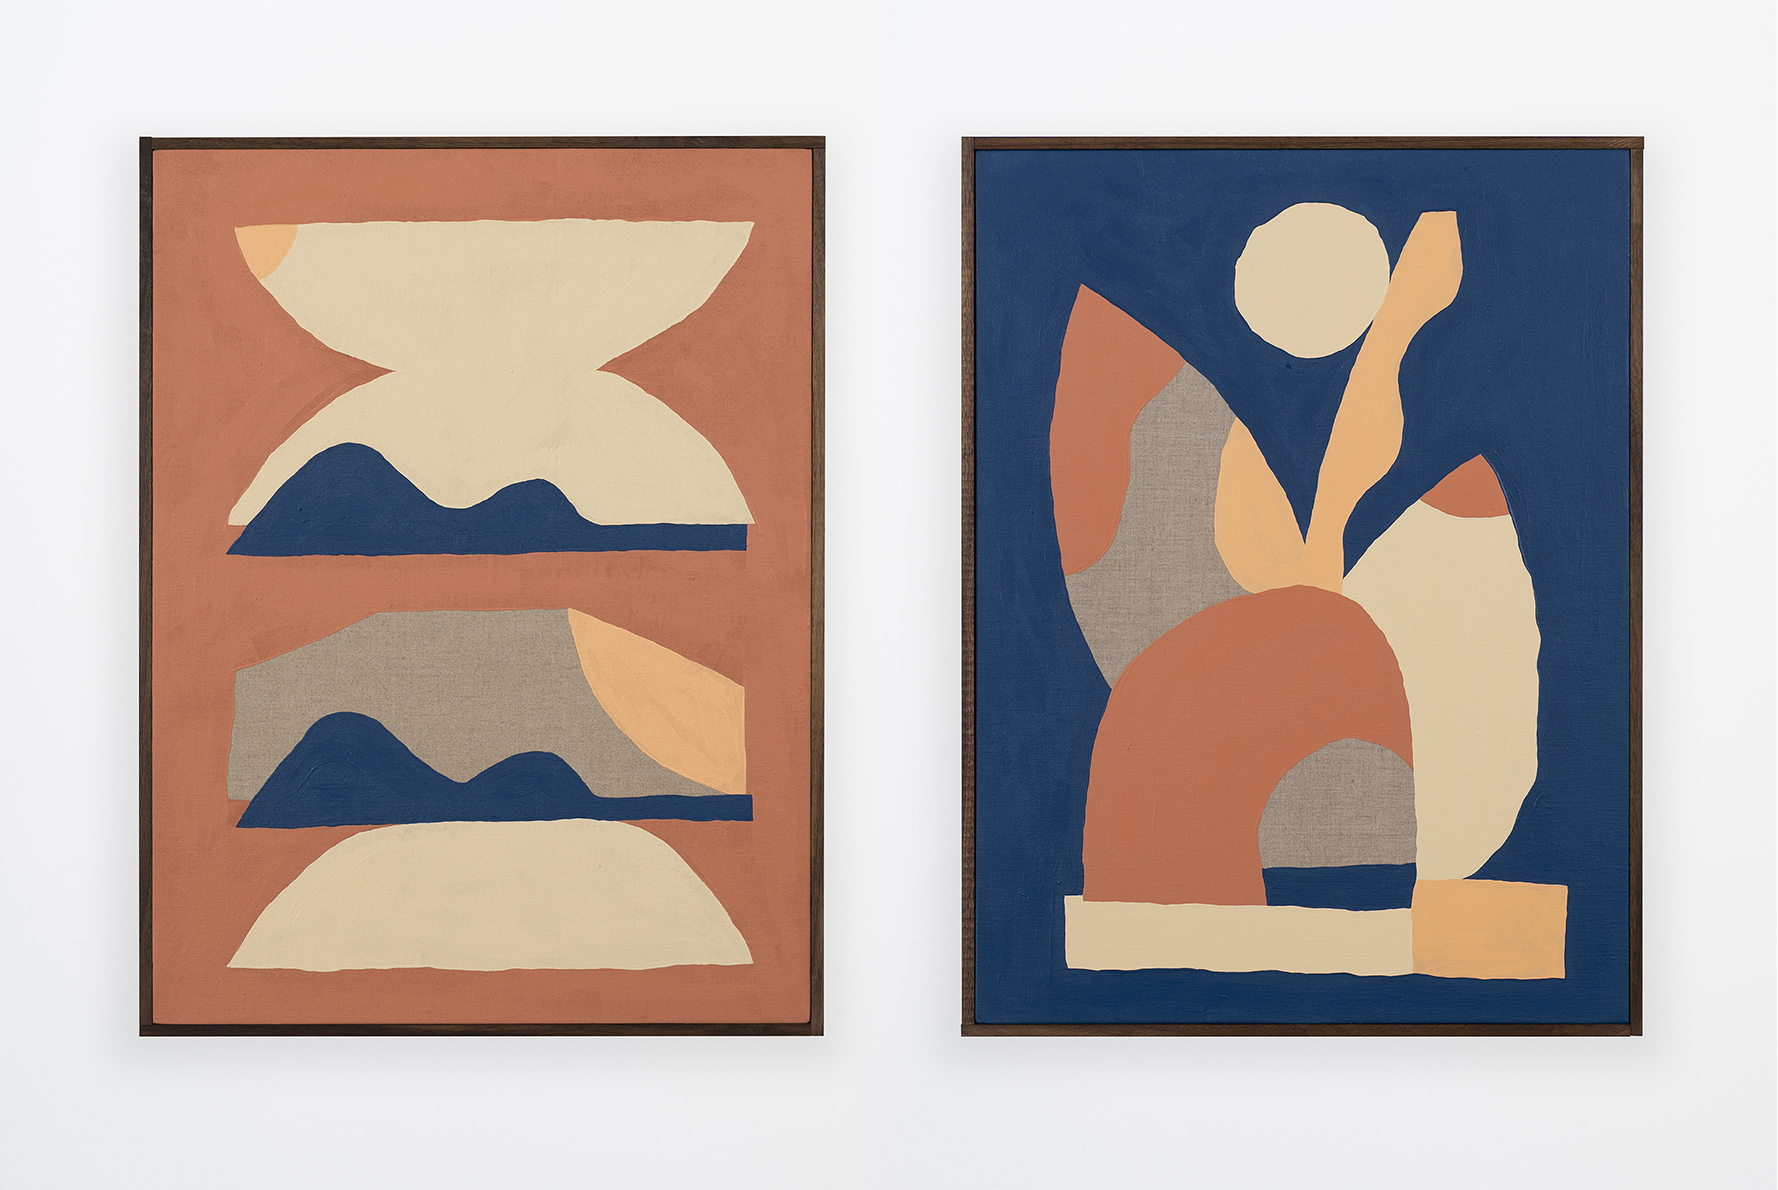 2019 Geodesic Domestic (Yucca Valley) Acrylic on Linen, 24 x 18   Earth Music (Human Scale) Acrylic on Linen, 24 x 18